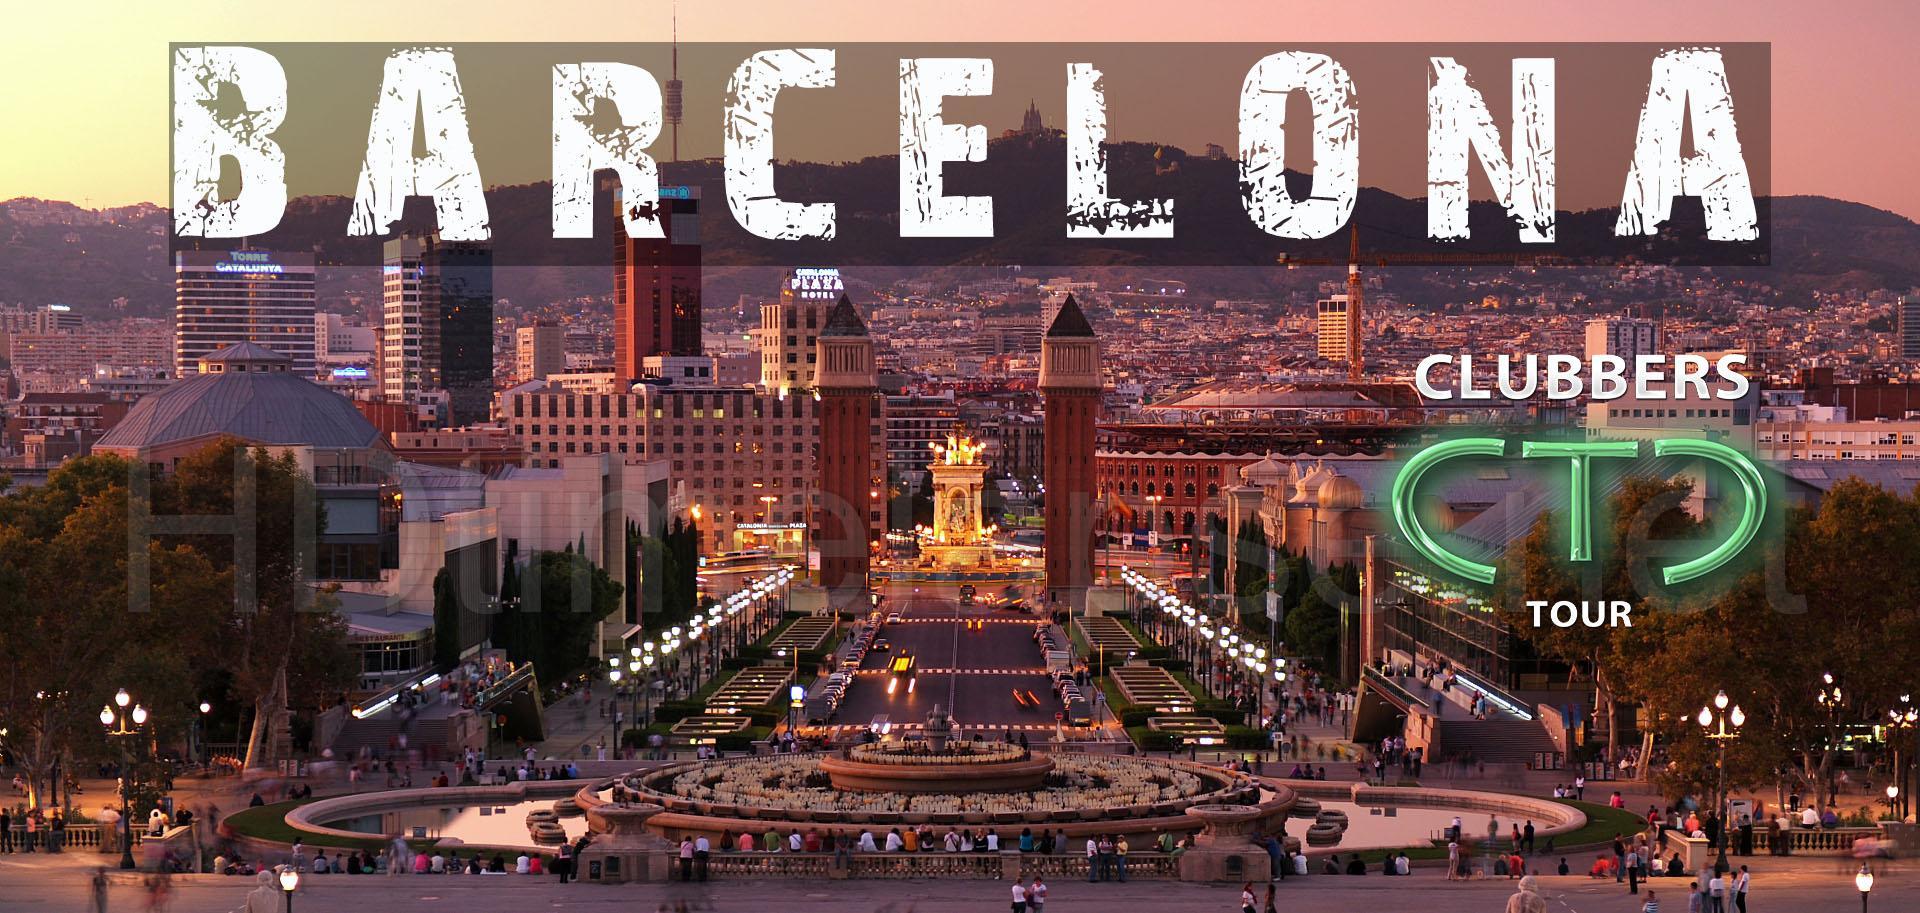 Clubbers Tour Barcelona Booking Pub Crawl Bar